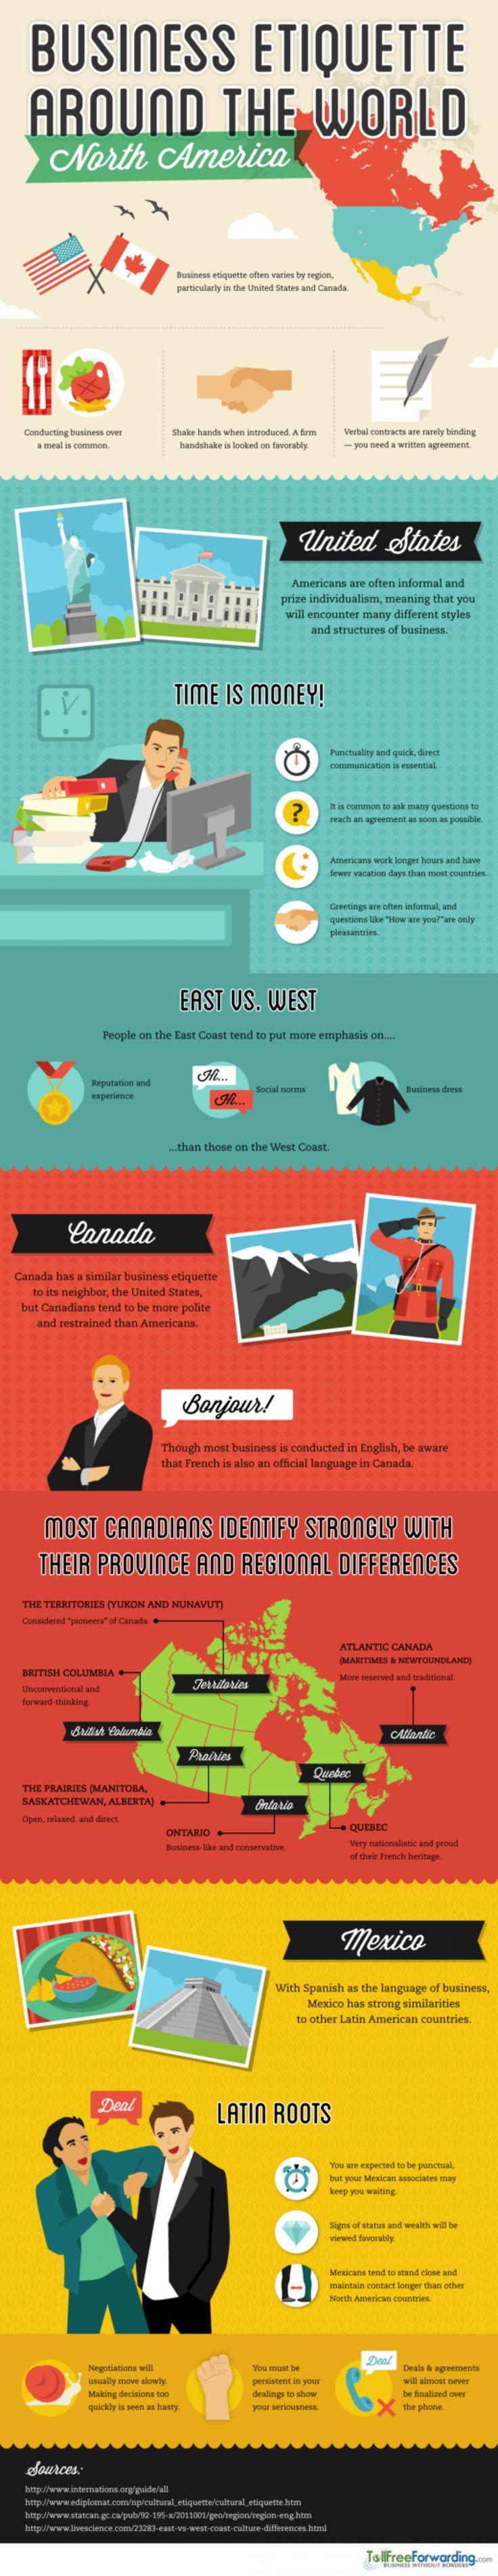 Business Etiquette: North America